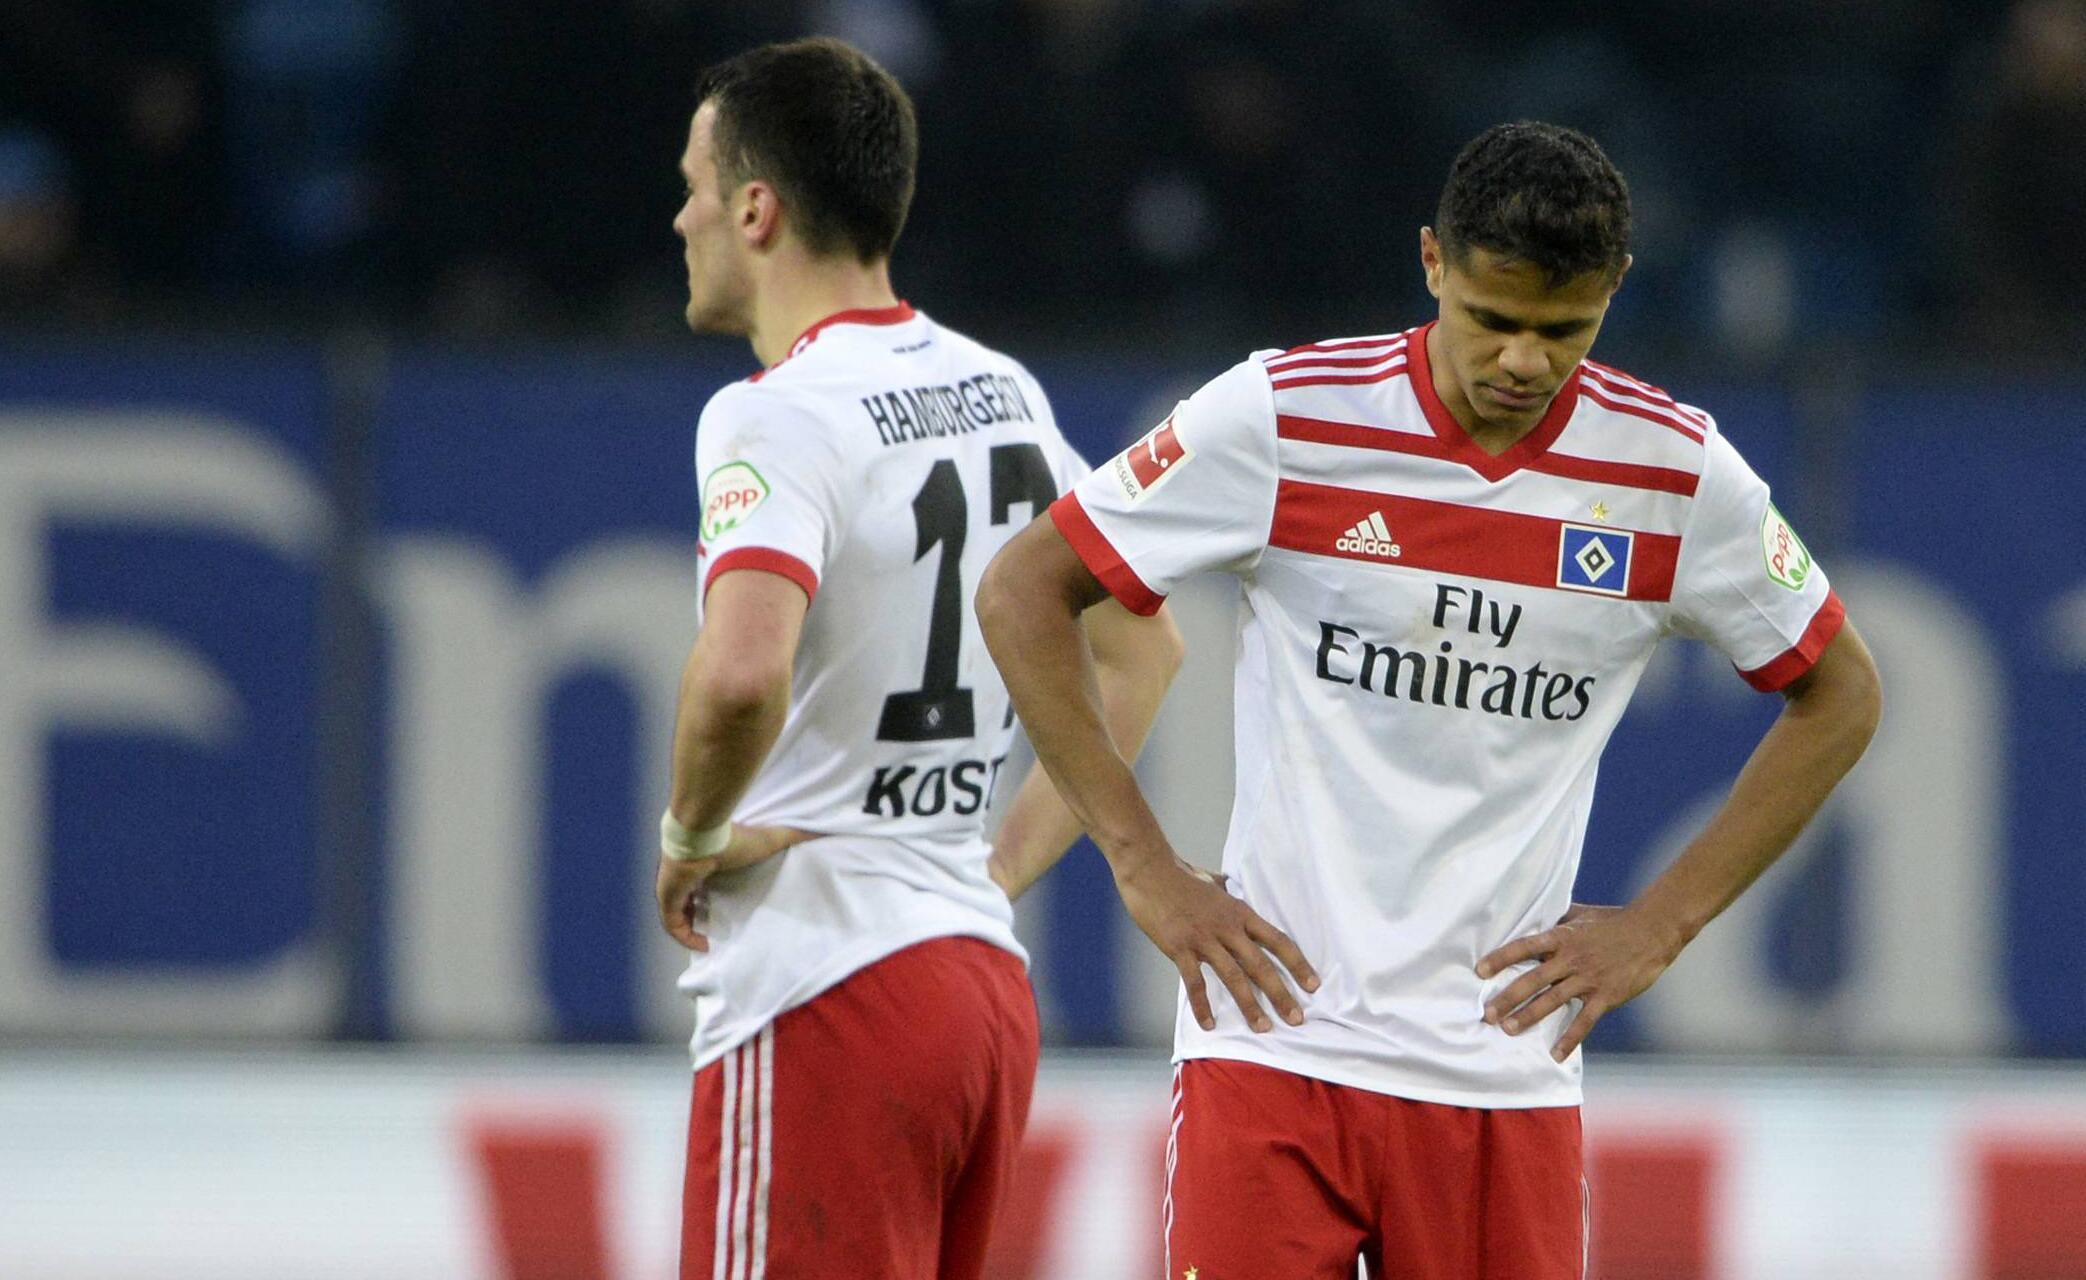 Bild zu Abstiegskampf, Hamburger SV, Bundesliga, HSV, Hanseaten